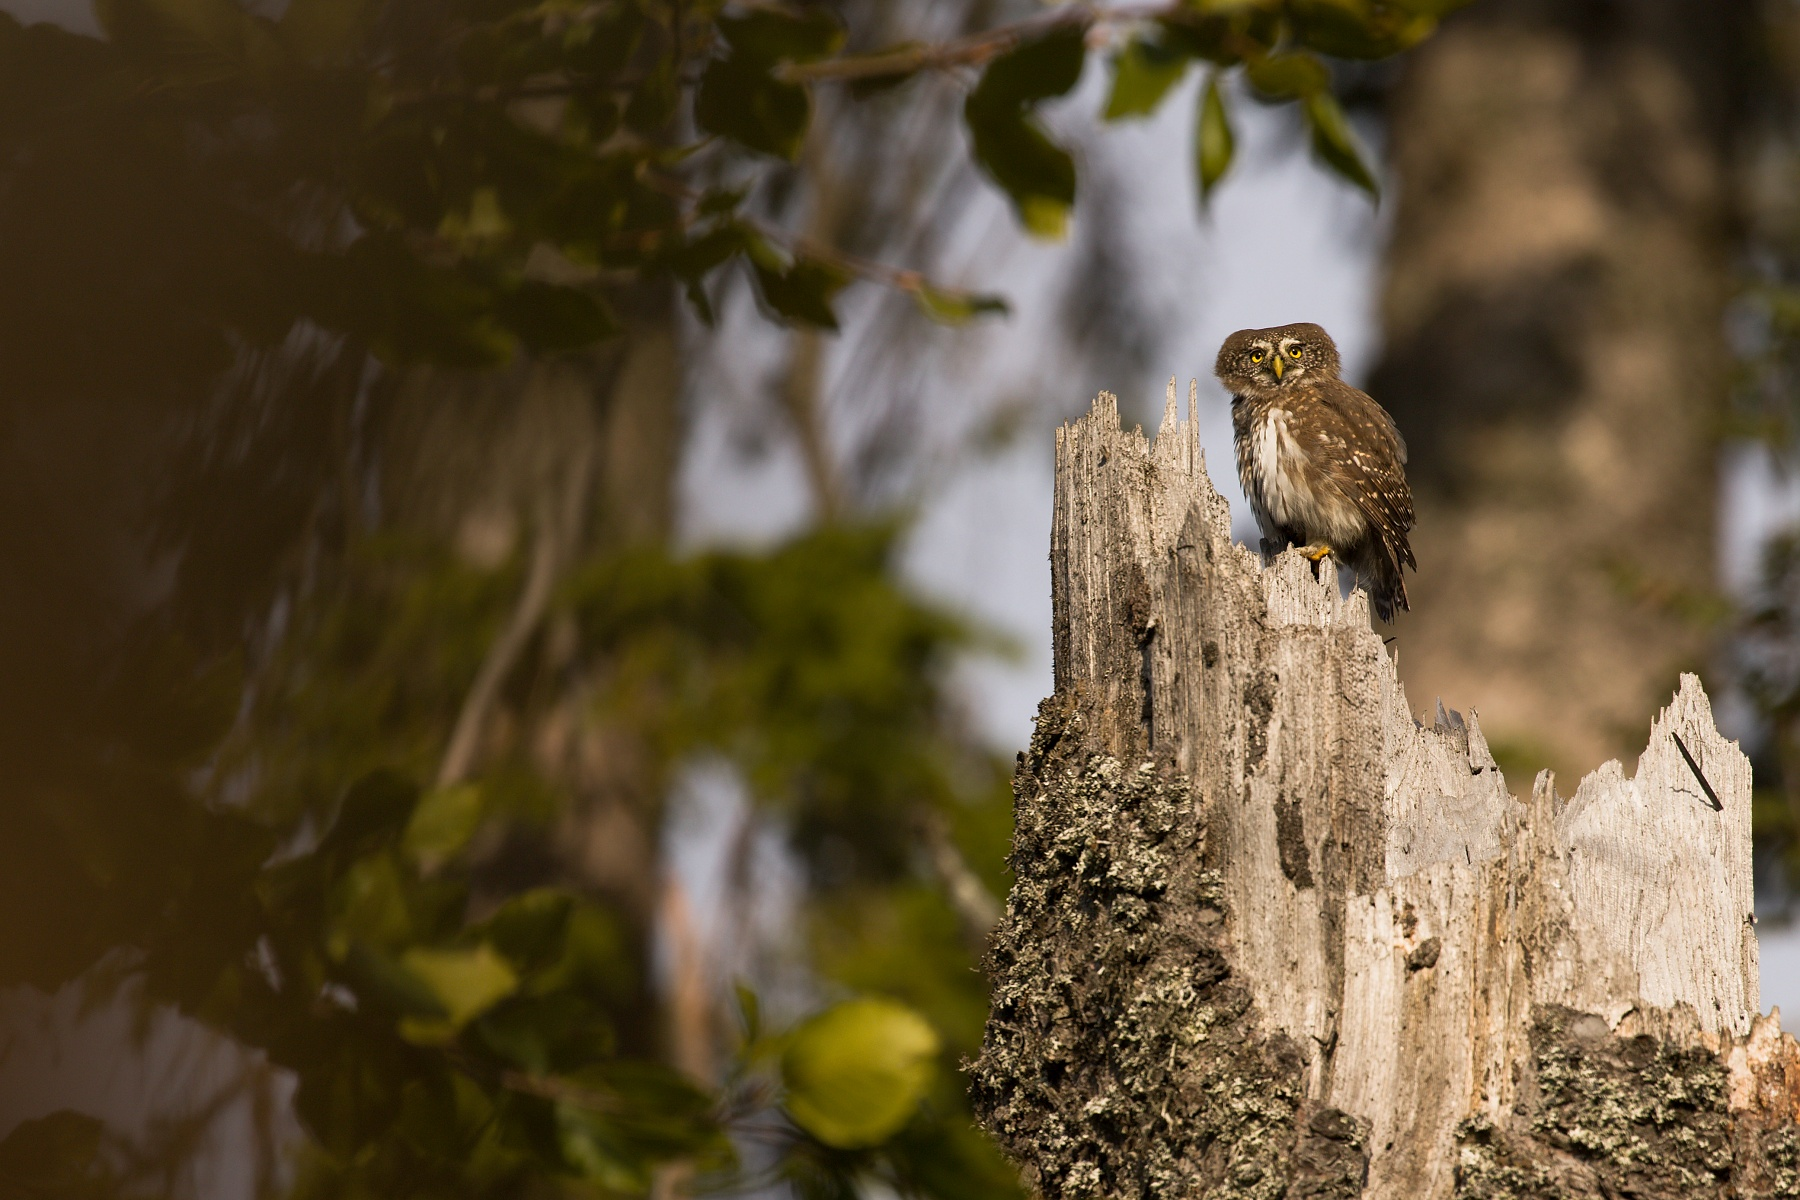 kuvičok vrabčí (Glaucidium passerinum) Pygmy owl, Muránska planina, Slovensko